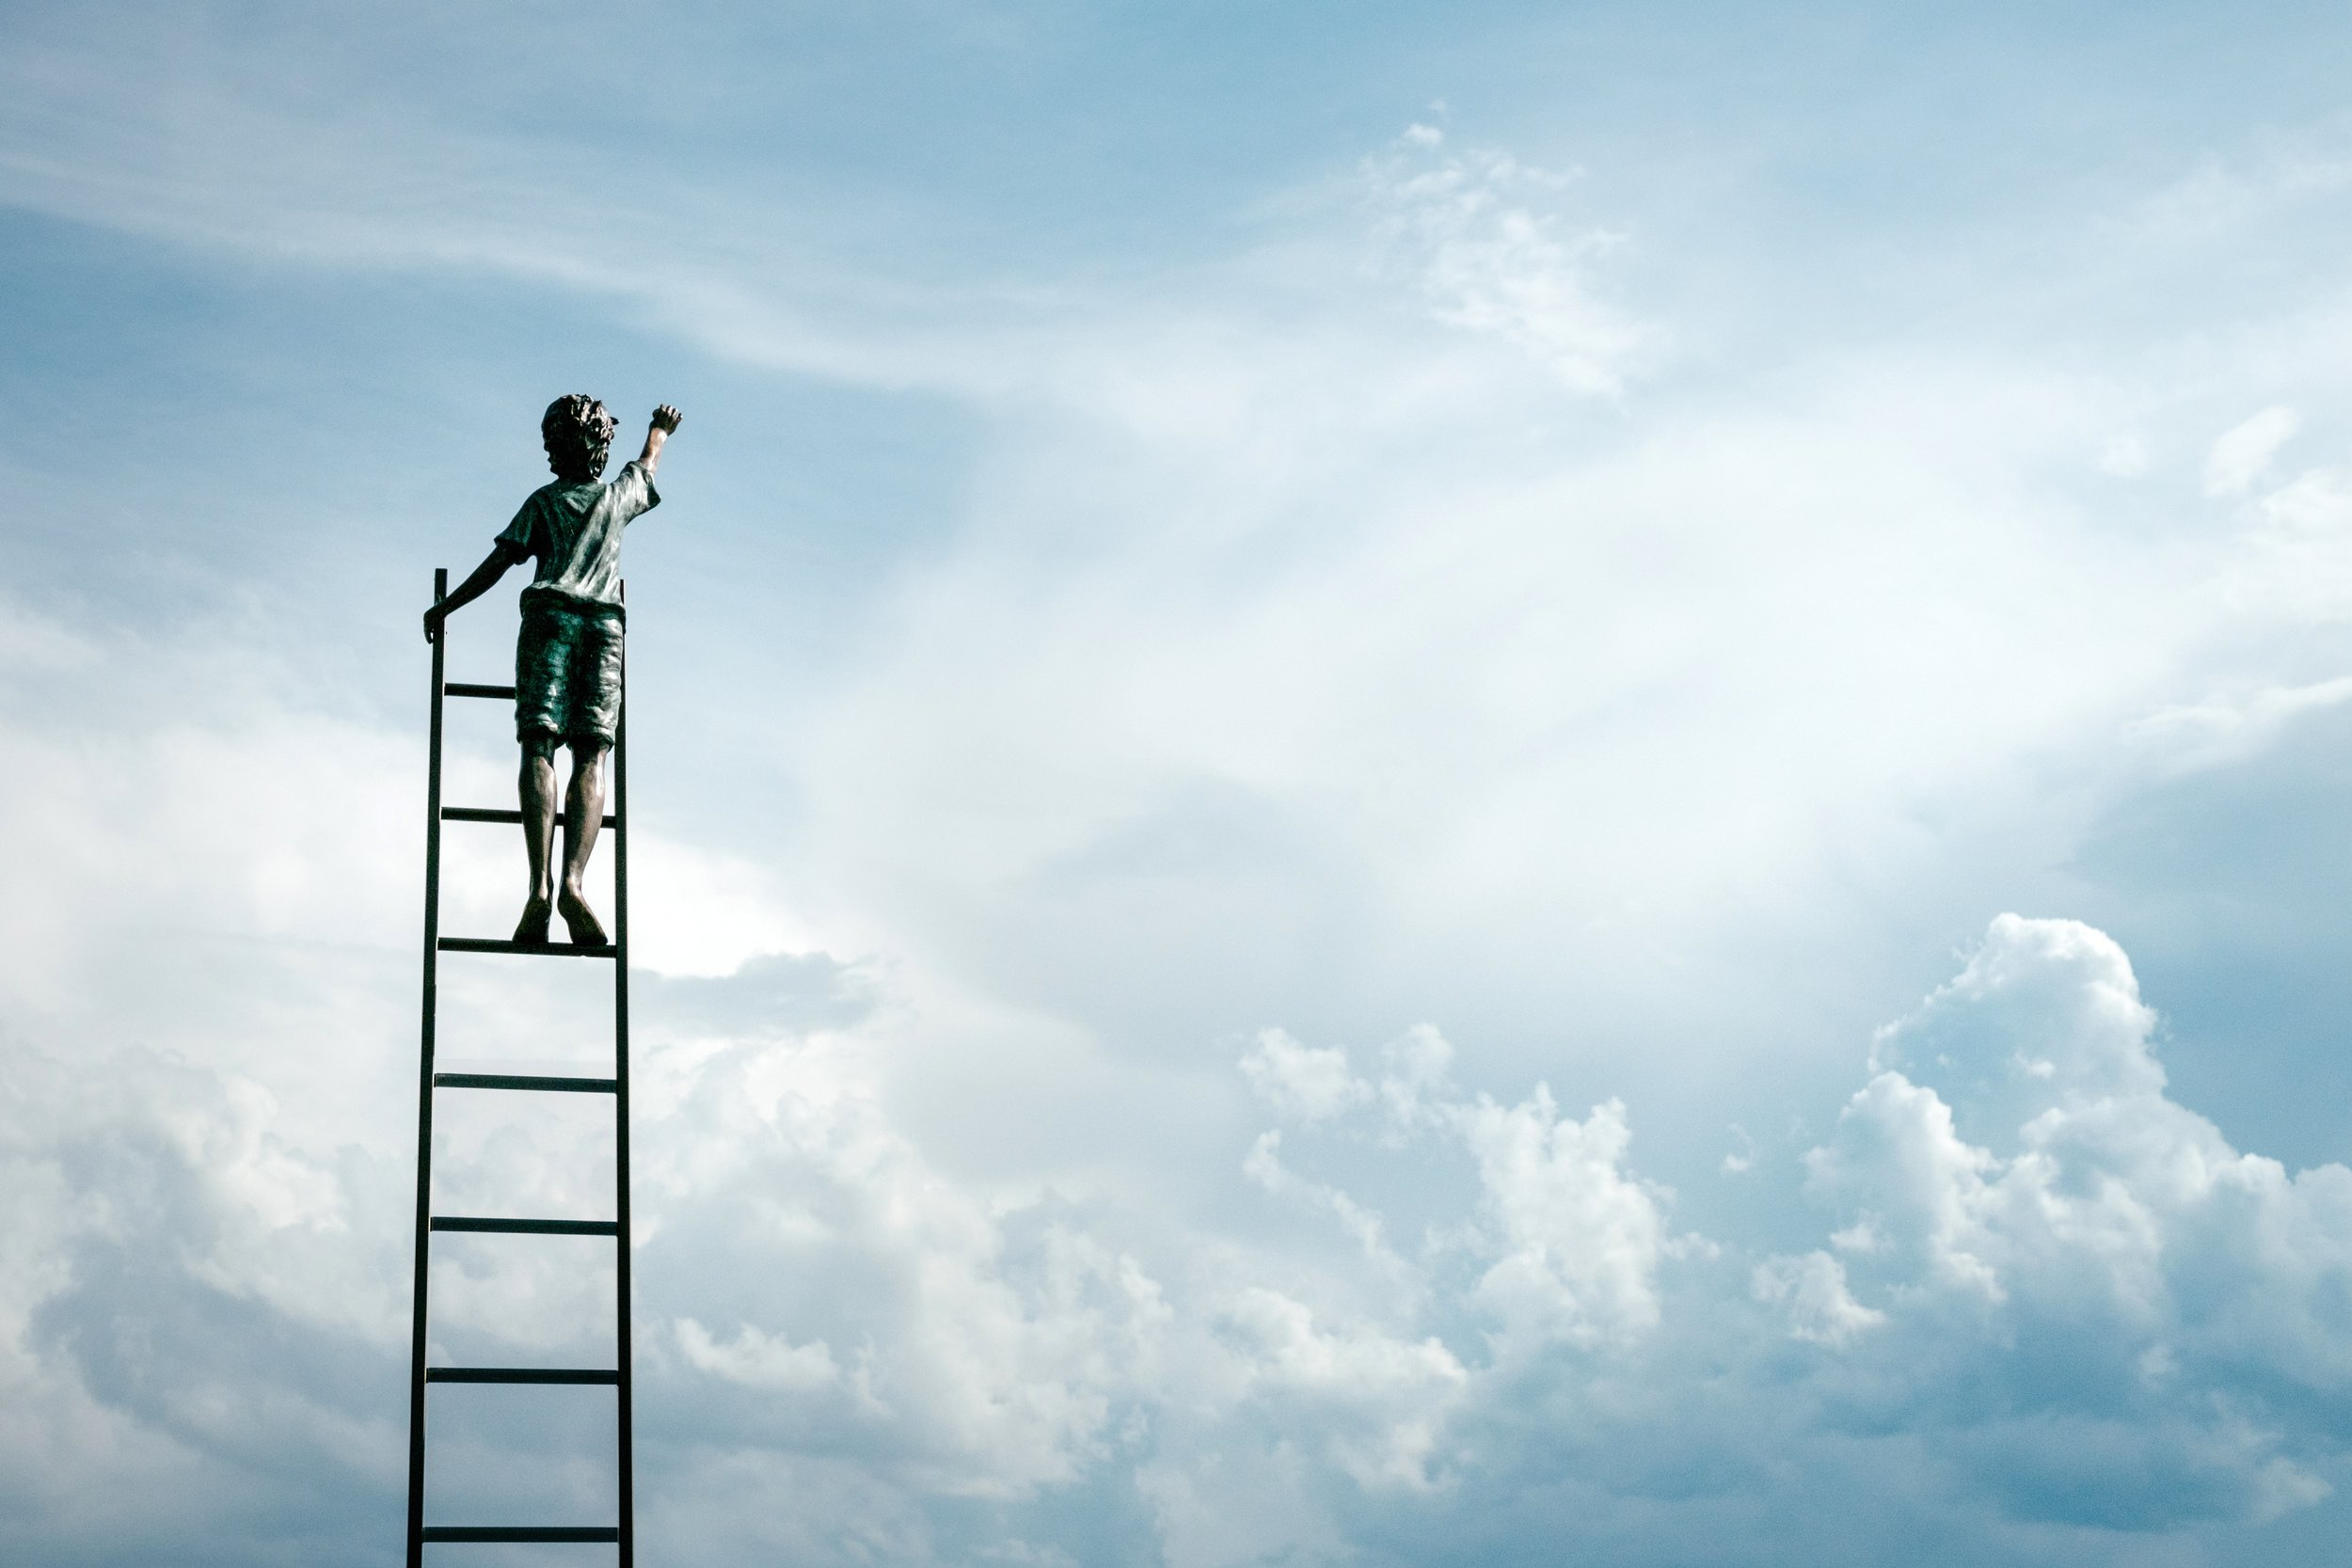 thinkinglikeanentrepreneur-successfulentrepreneur-leadership.jpg